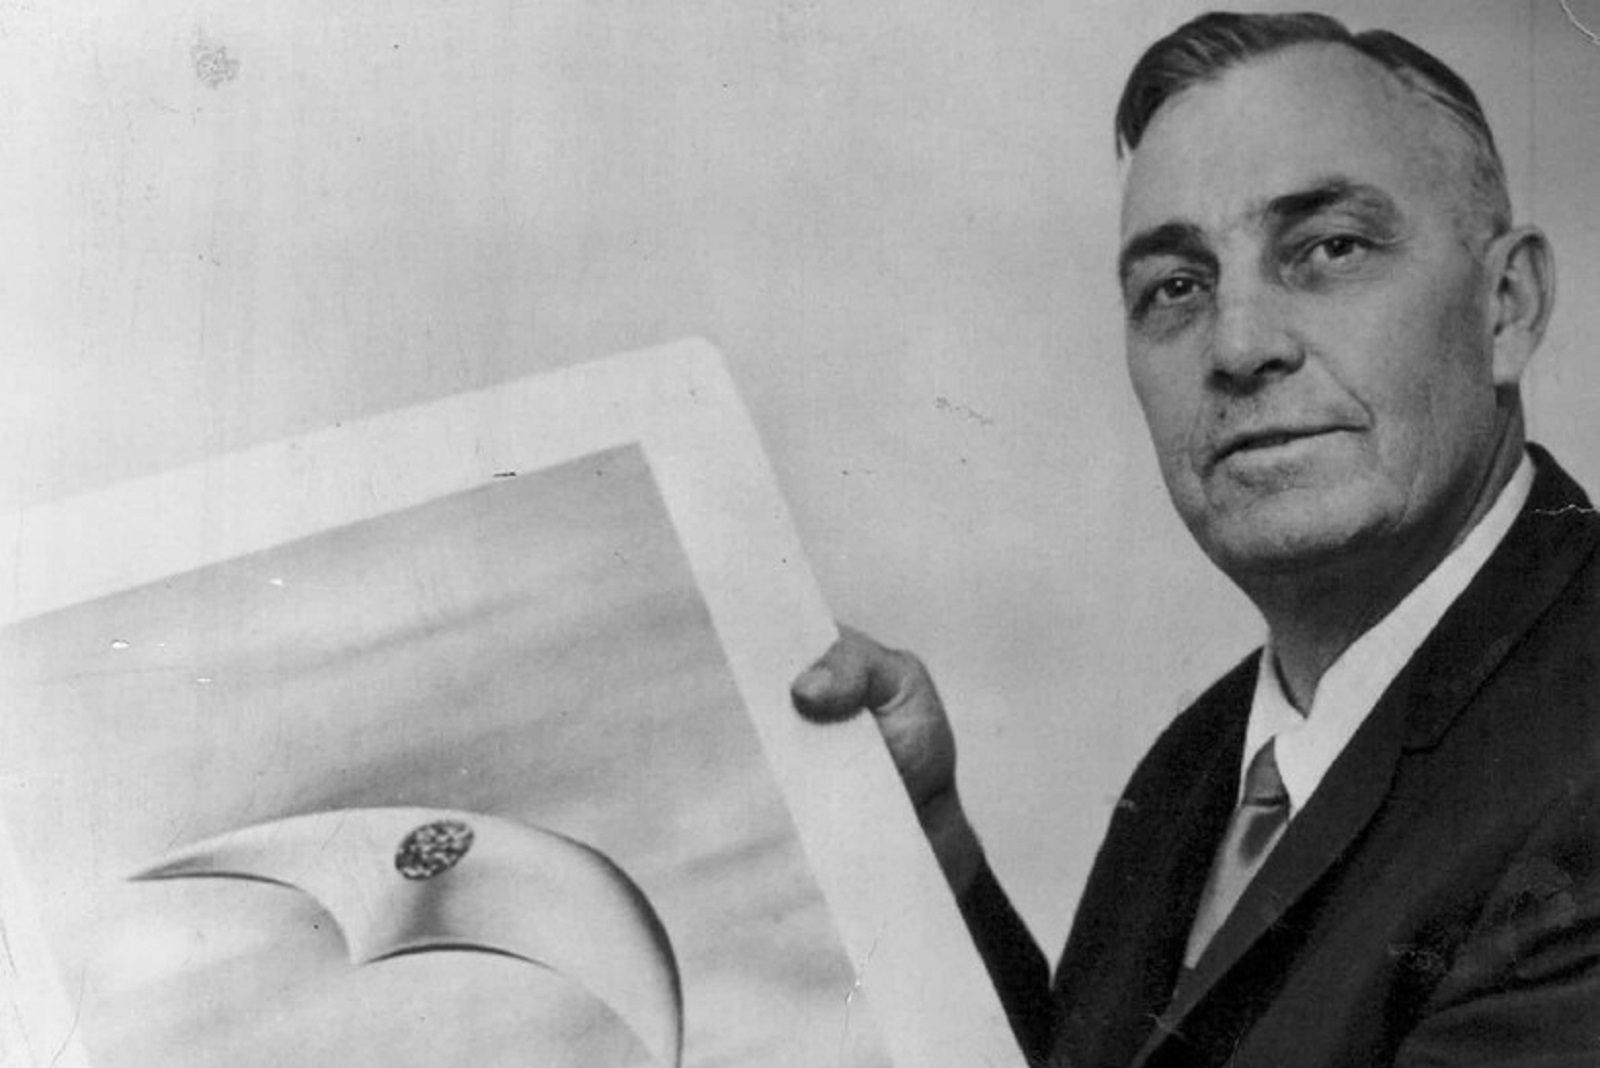 kenneth arnold-ovnis-ufos-ufologia-ovni-monte rainier-24 de junio de 1947-washington